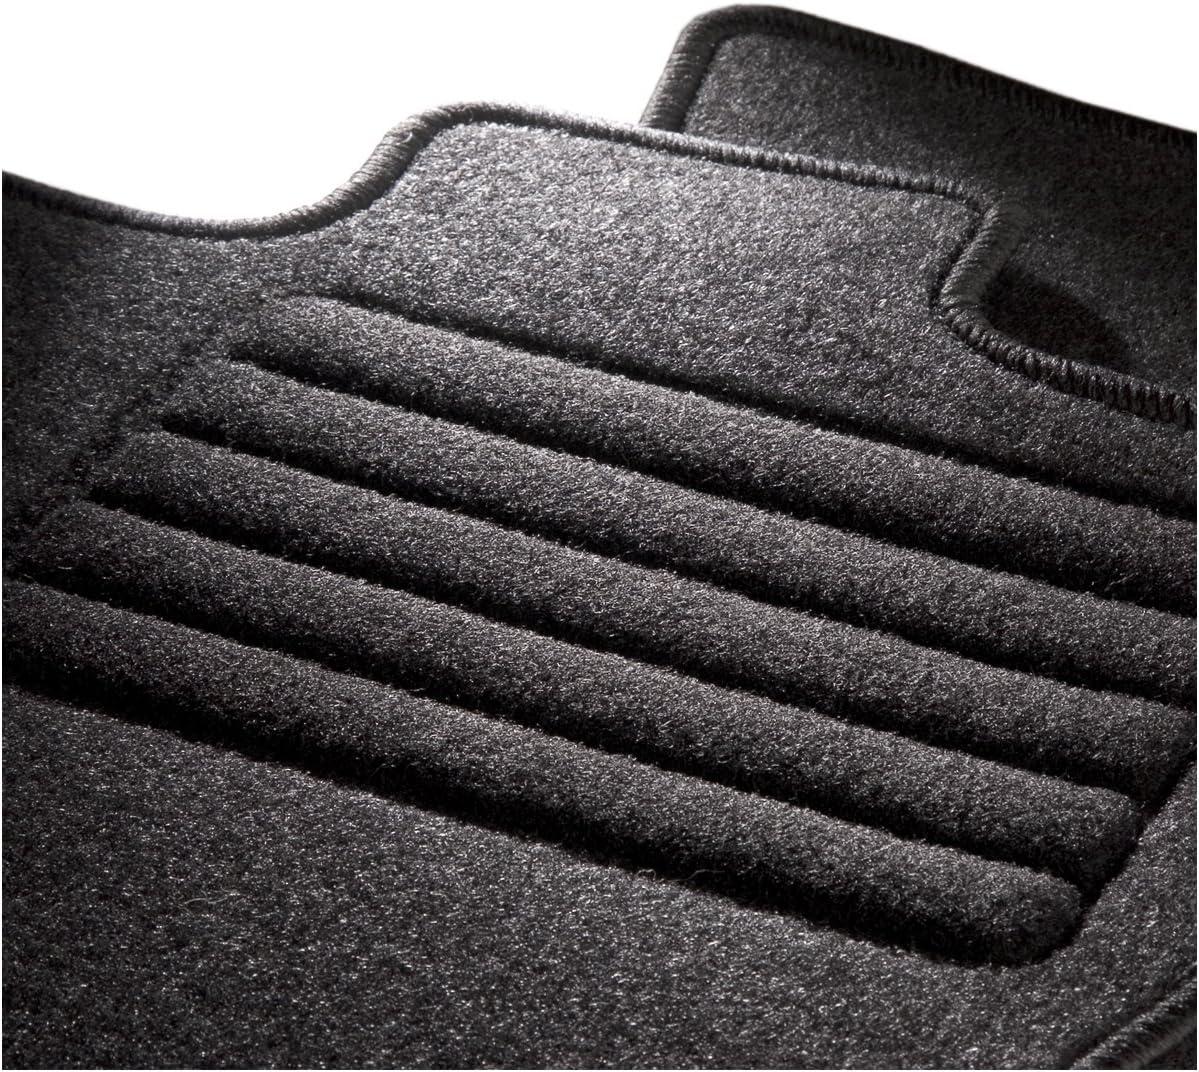 rimagliati expuiplus por Peut 206/Â/Plus modelli costruiti Dal 04.2009/Â/-/Â/00.0000 CarFashion/Â/-/Â/tappetini per Auto